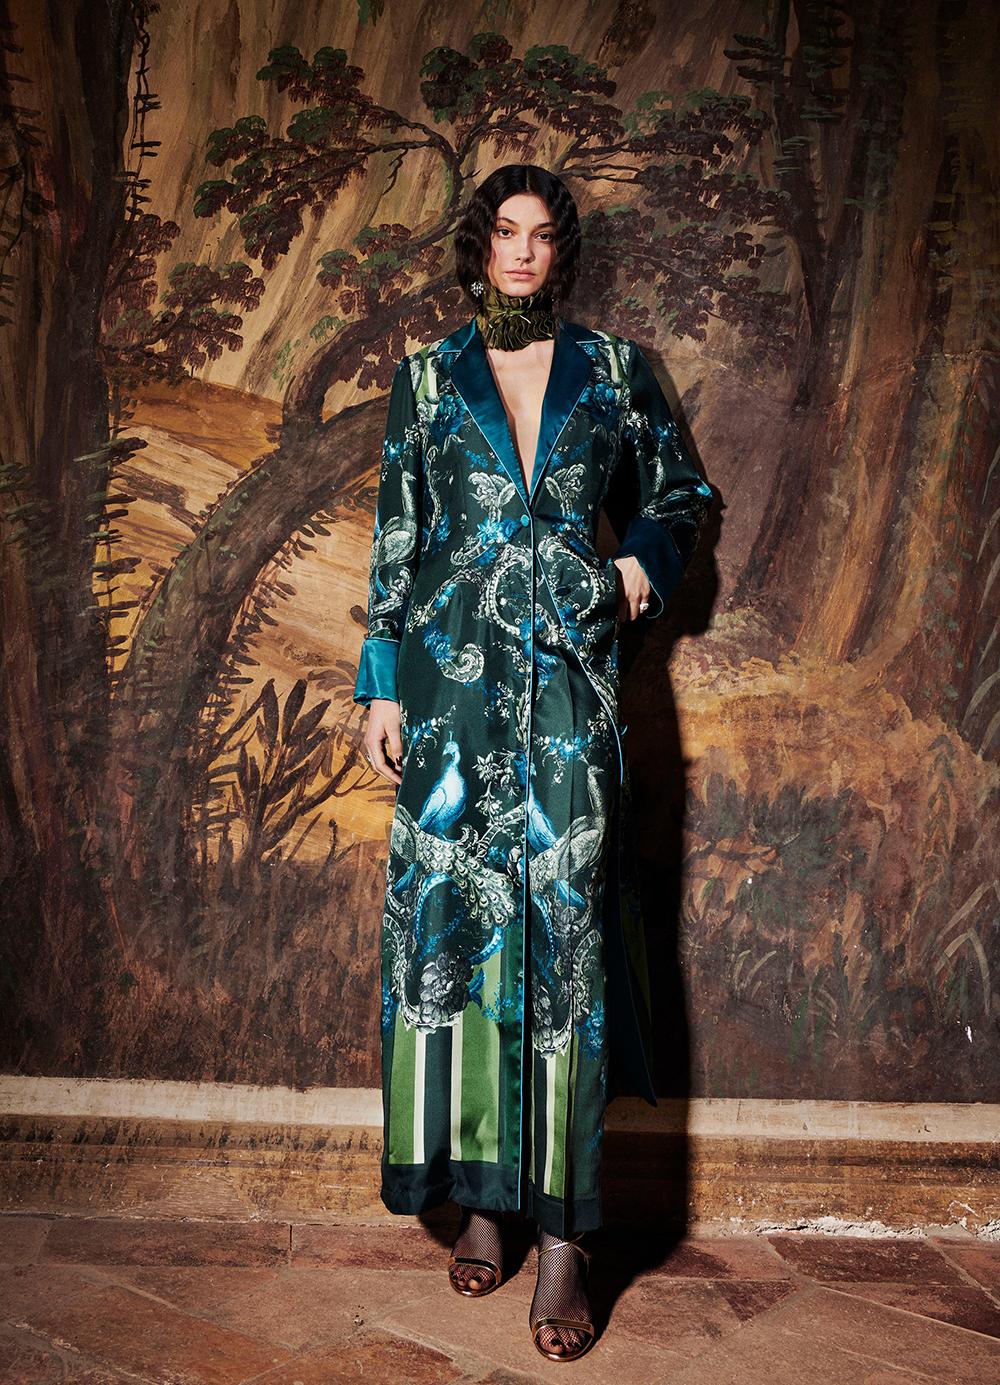 Best Milan Fashion Week Looks I For Restless Sleepers #MFW #FashionWeek #runway